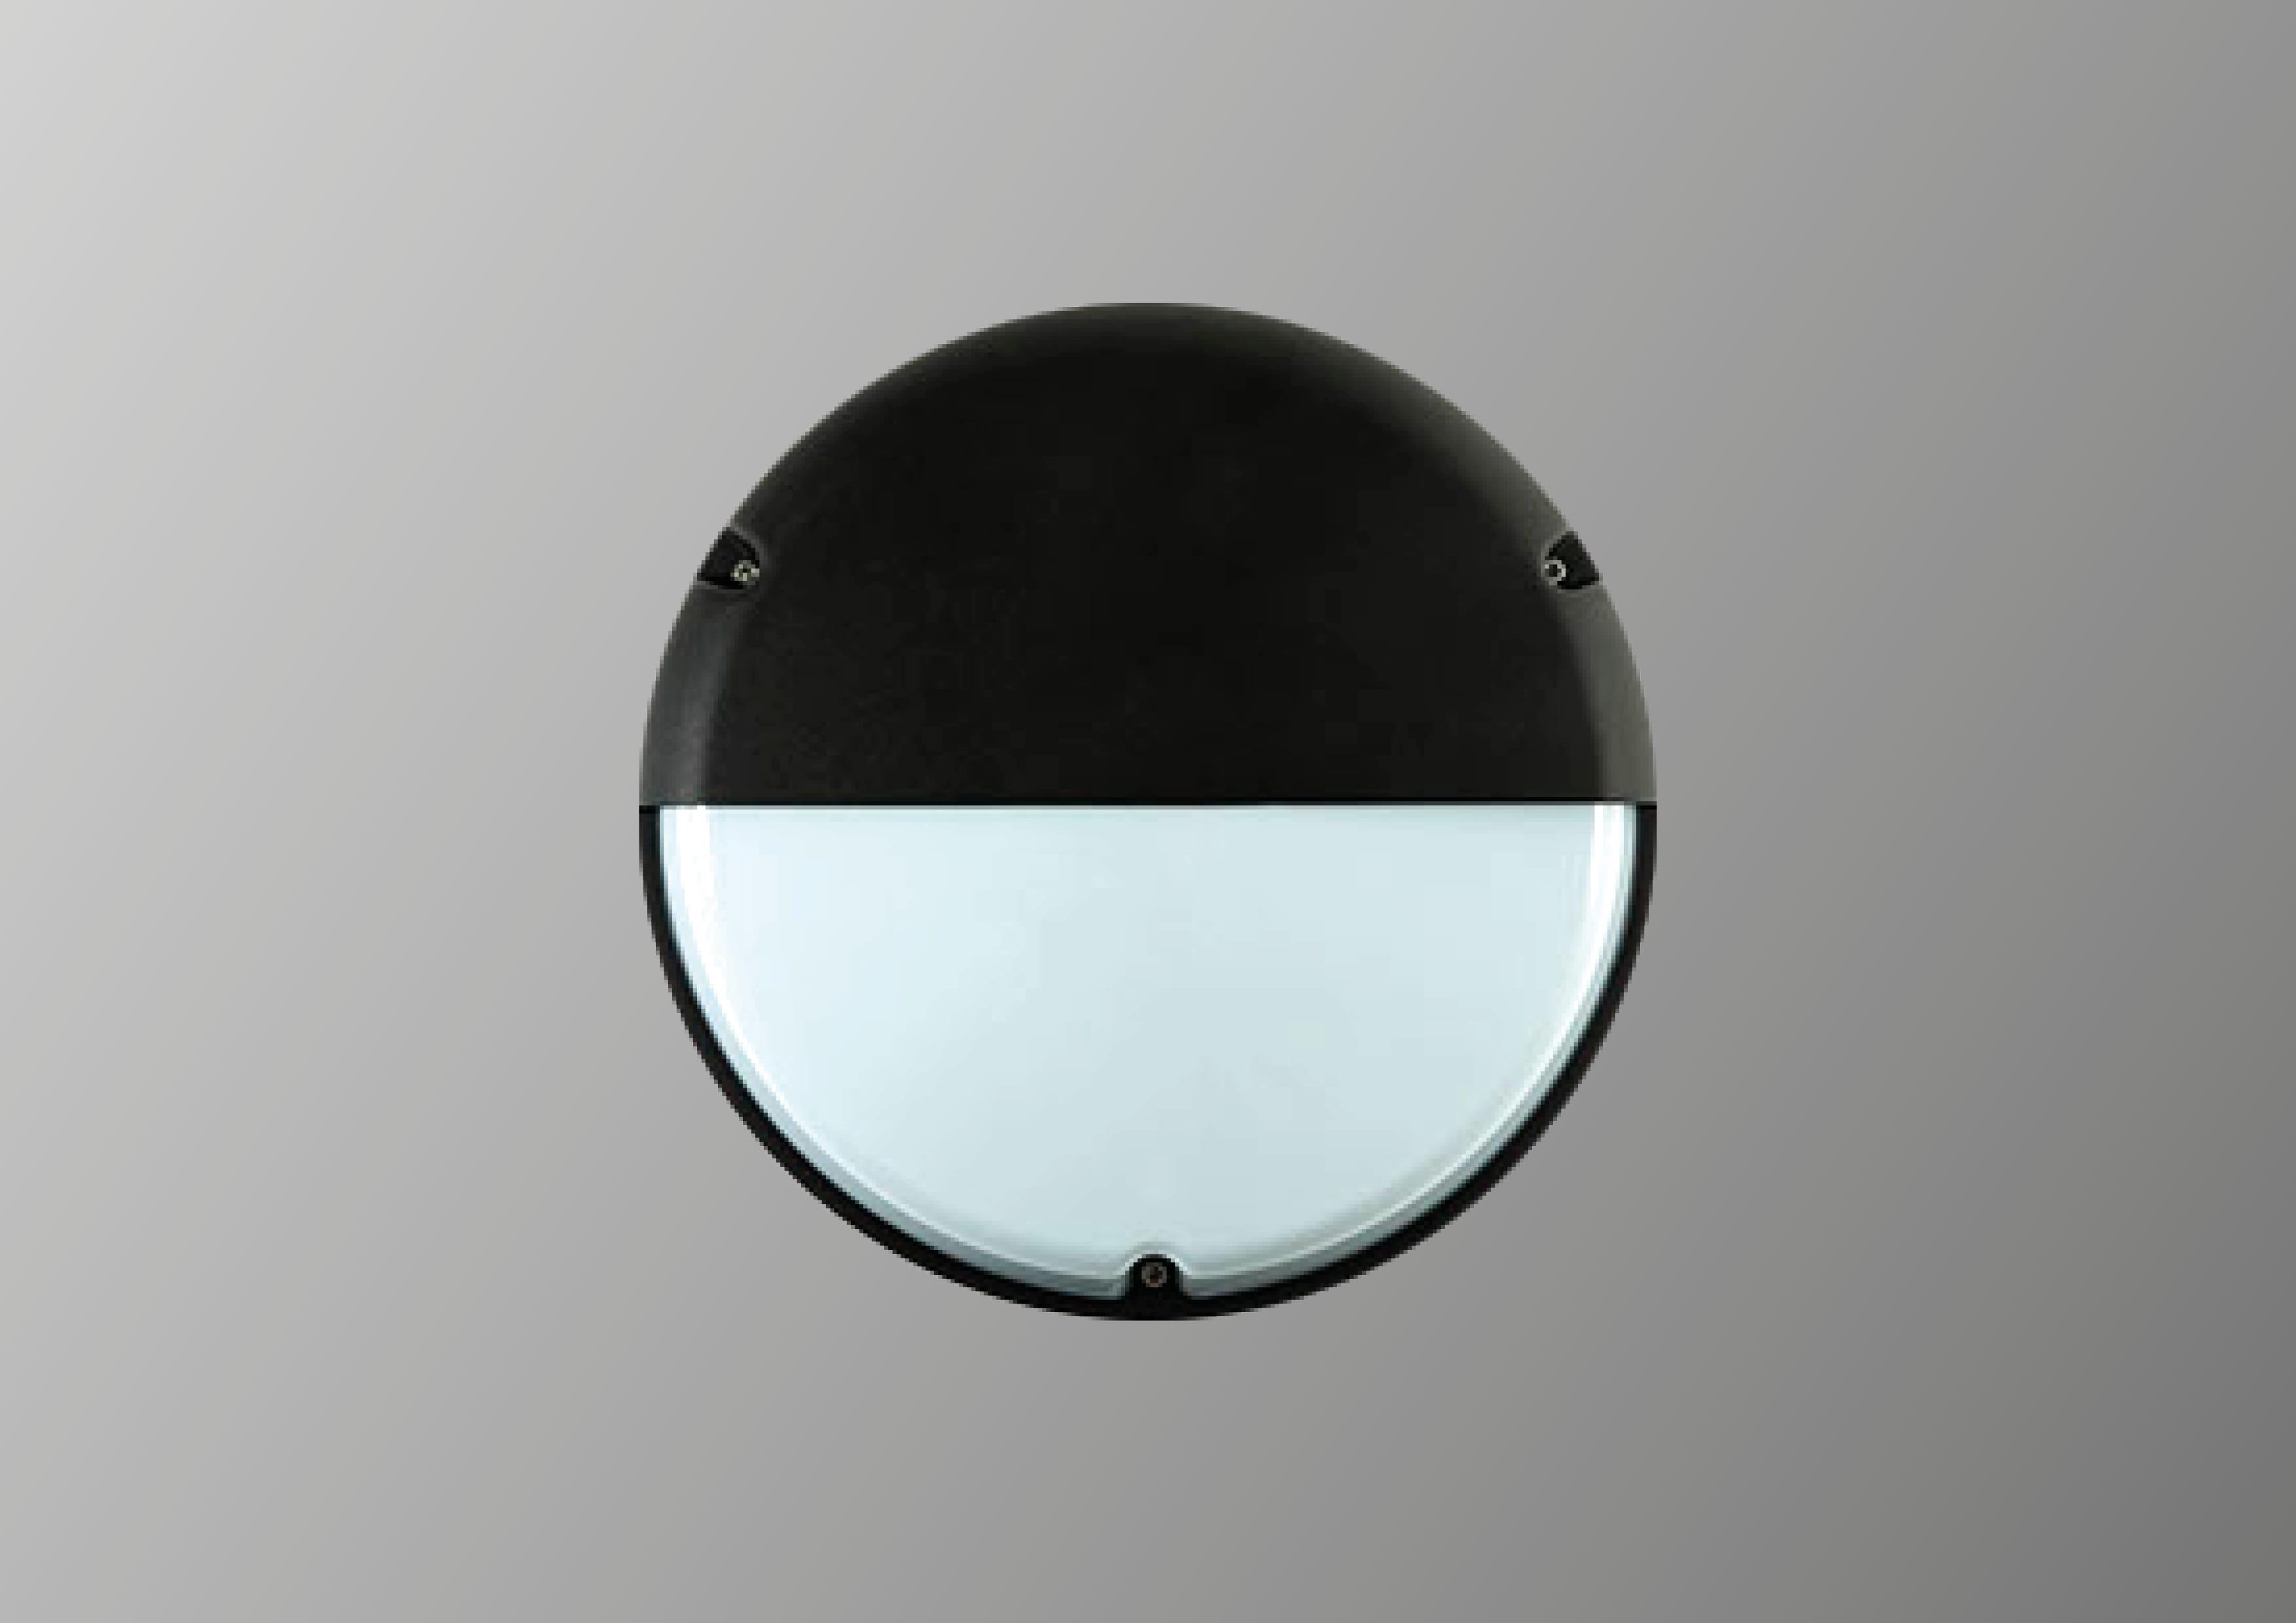 https://contrac-lighting.co.uk/wp-content/uploads/2018/01/LEO-HALFHOOD-BULKHEAD-1.jpg